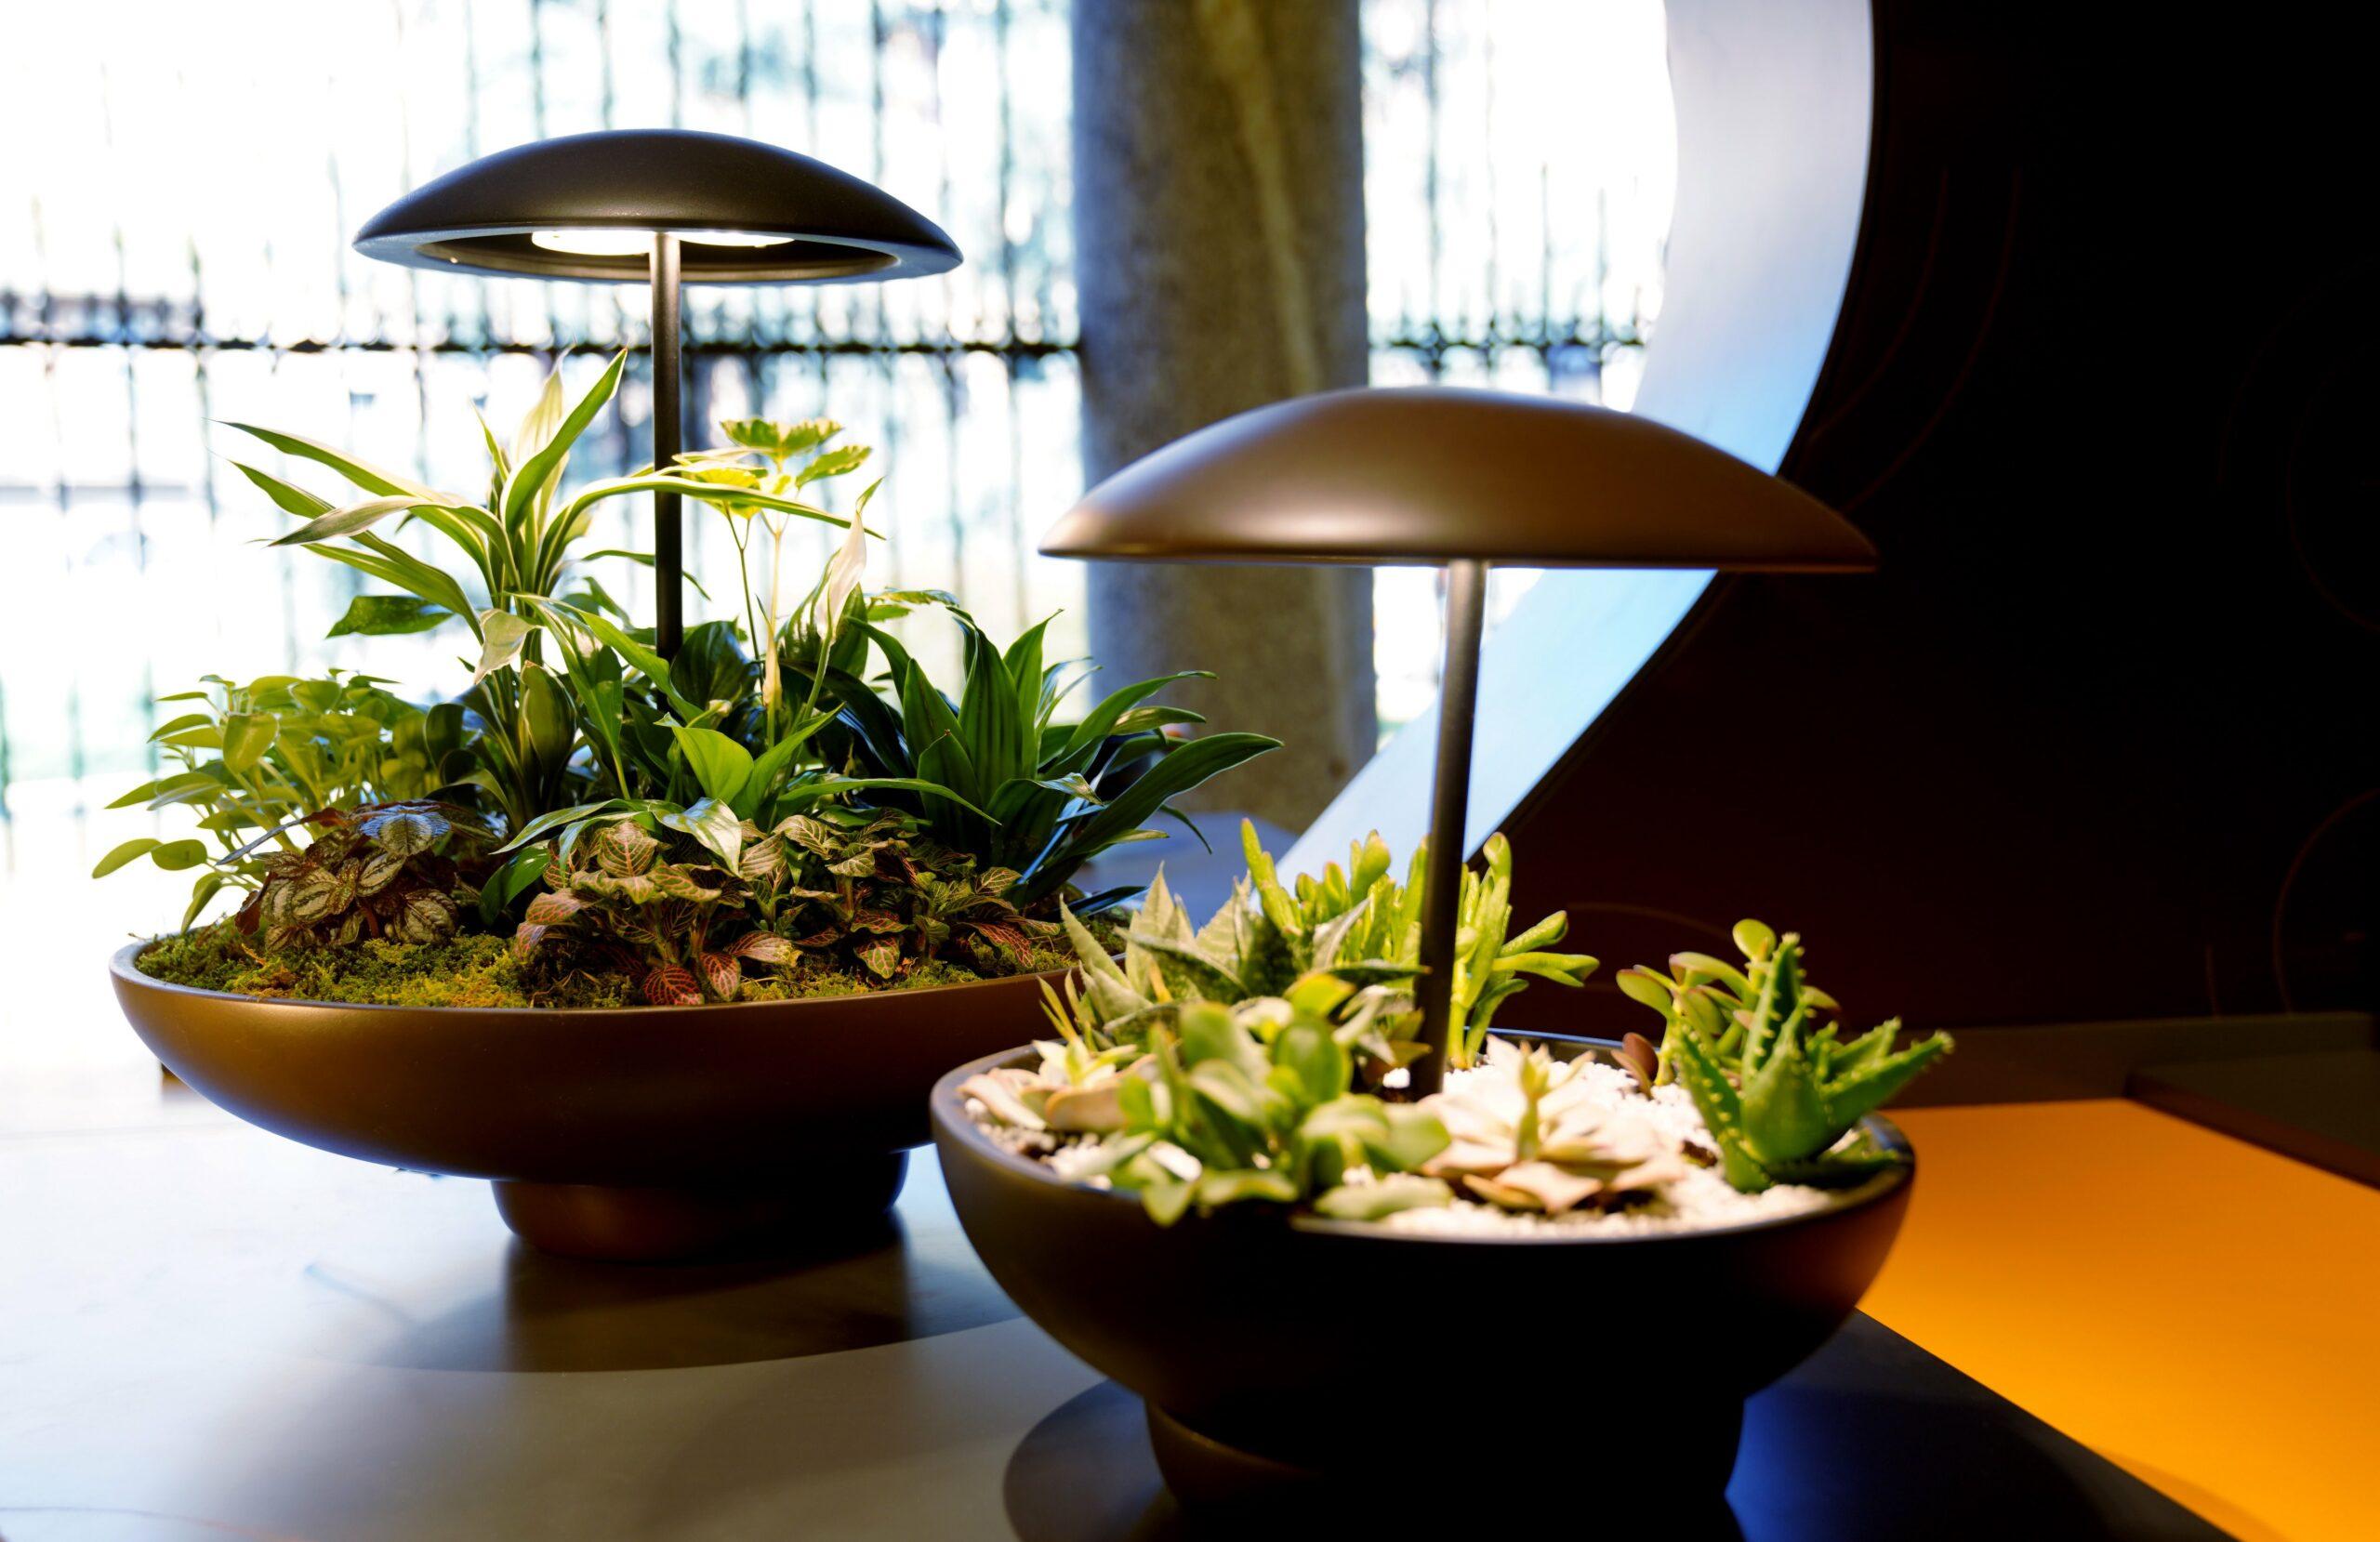 Garden: la lampada da tavolo con mini giardino, disegnata da Maurício D'Ávila per la Milano Design Week